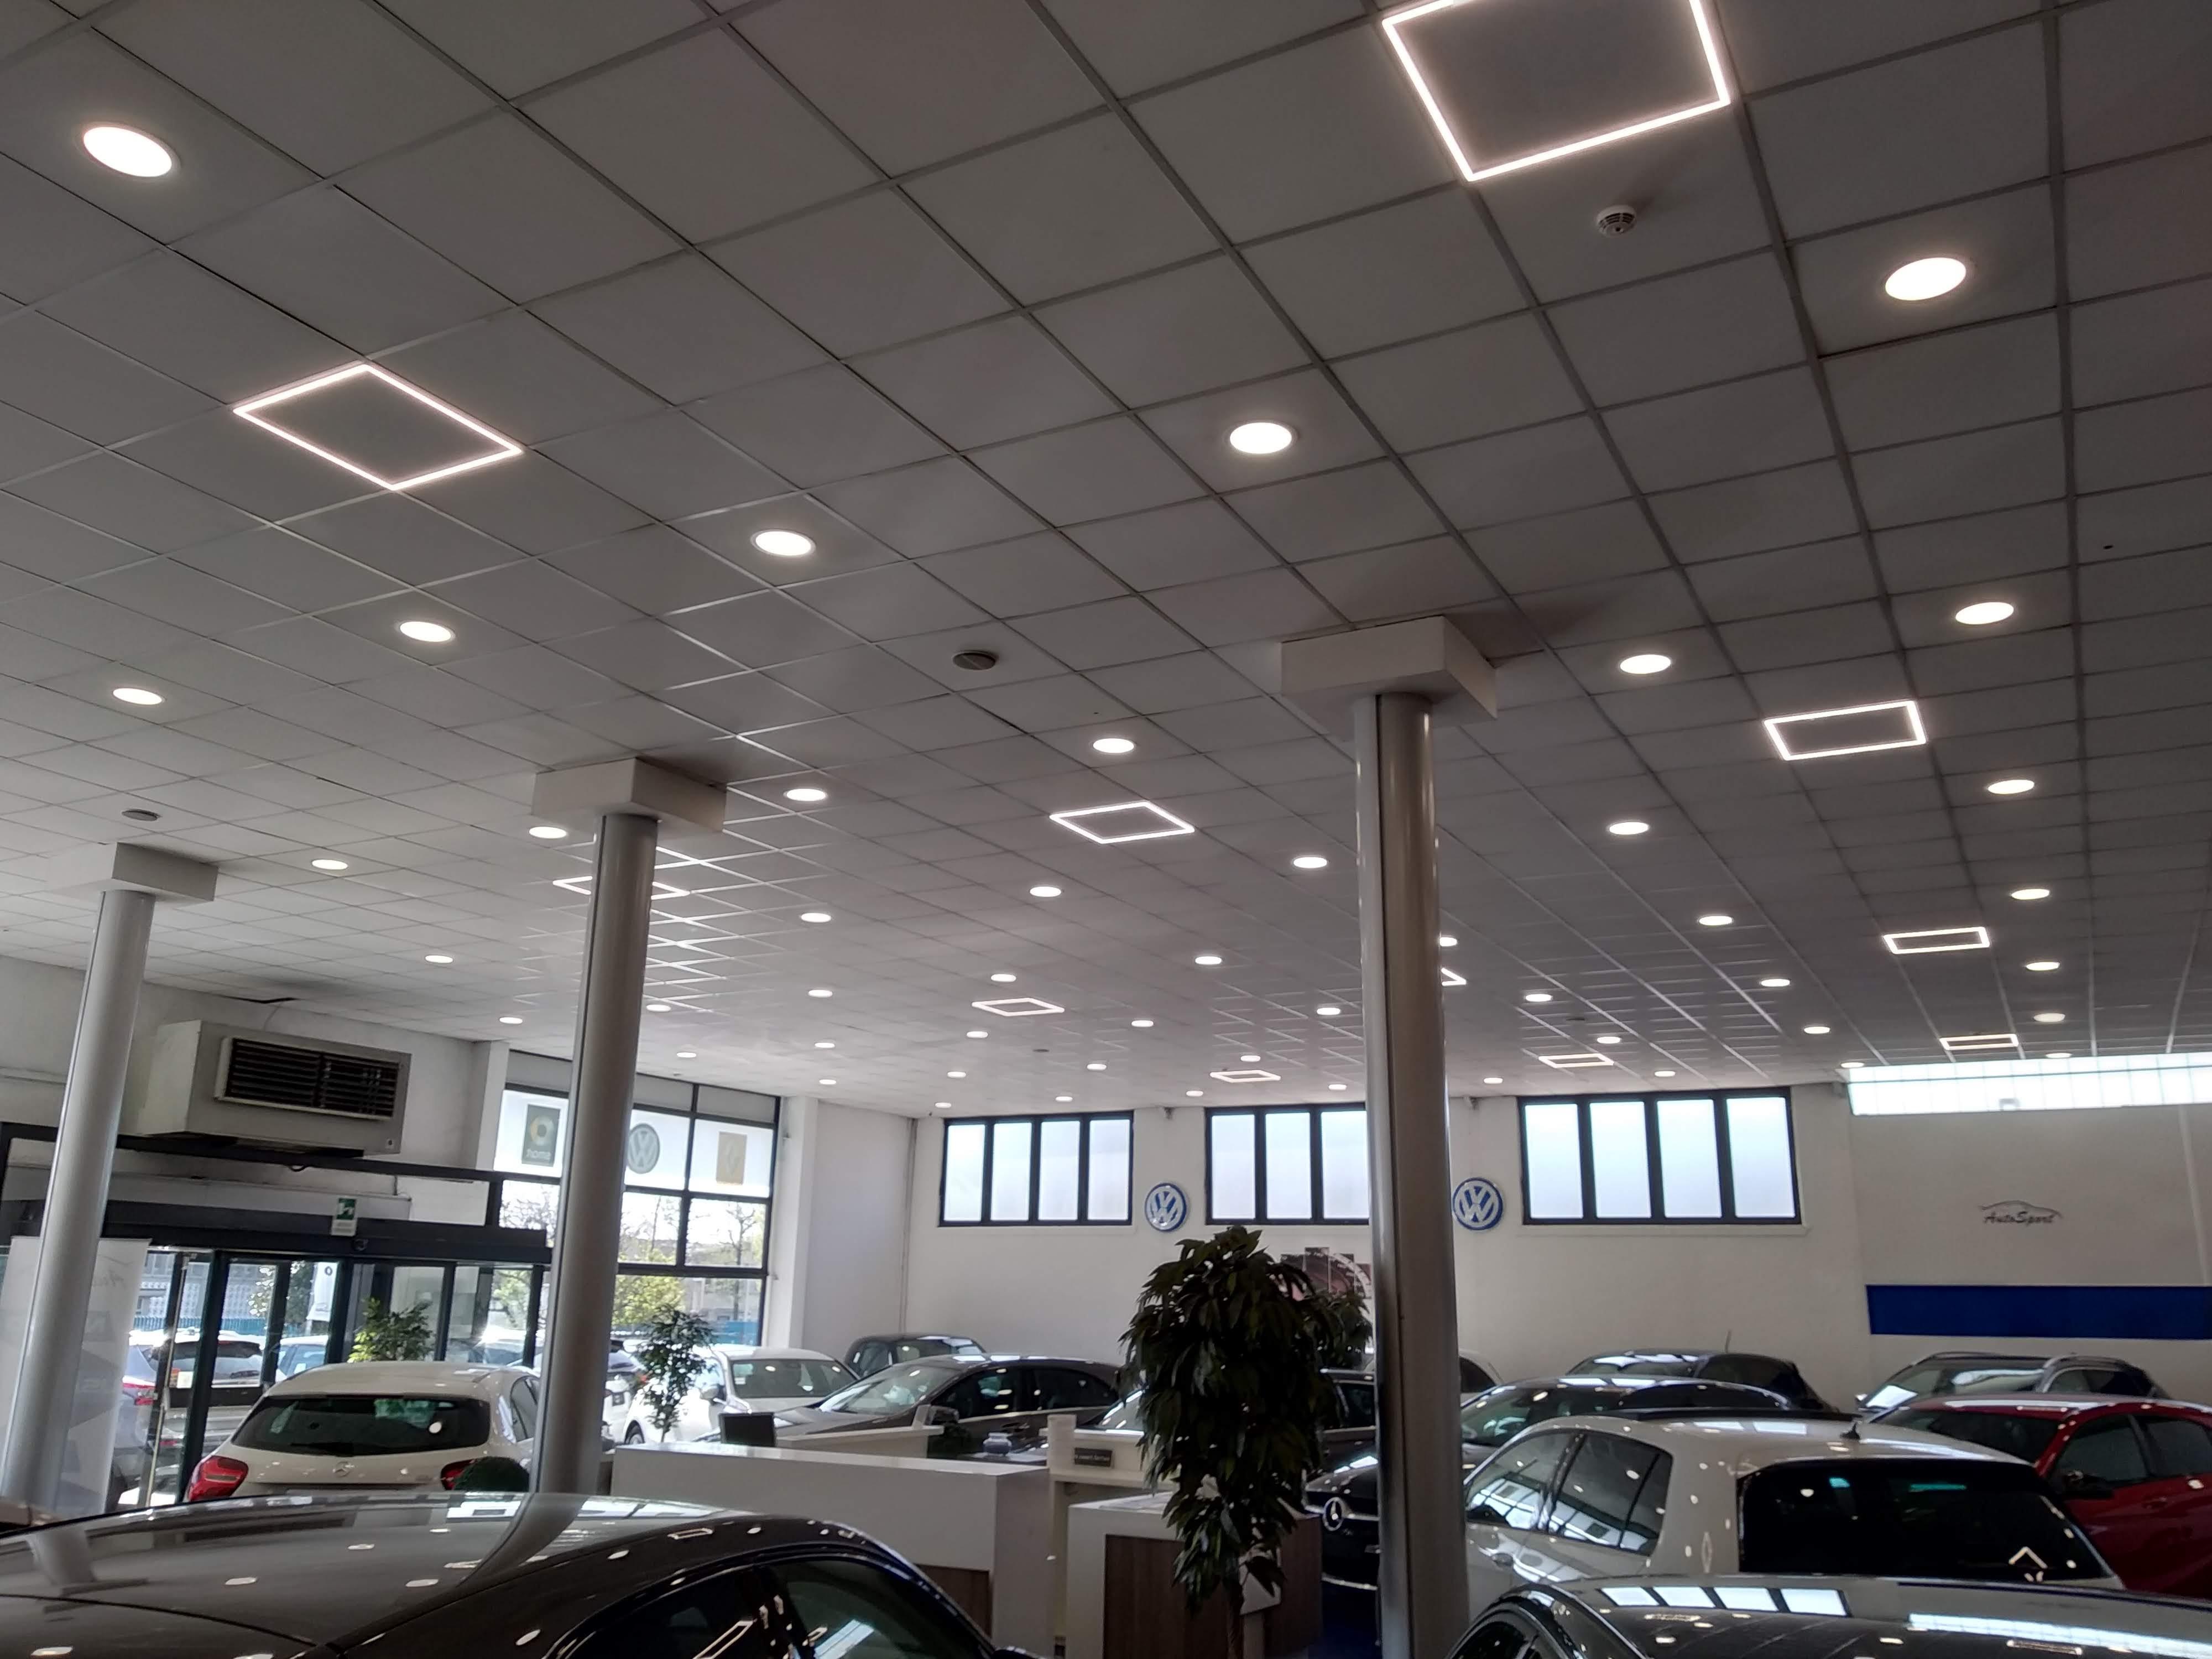 negozio cornice luminosa LED